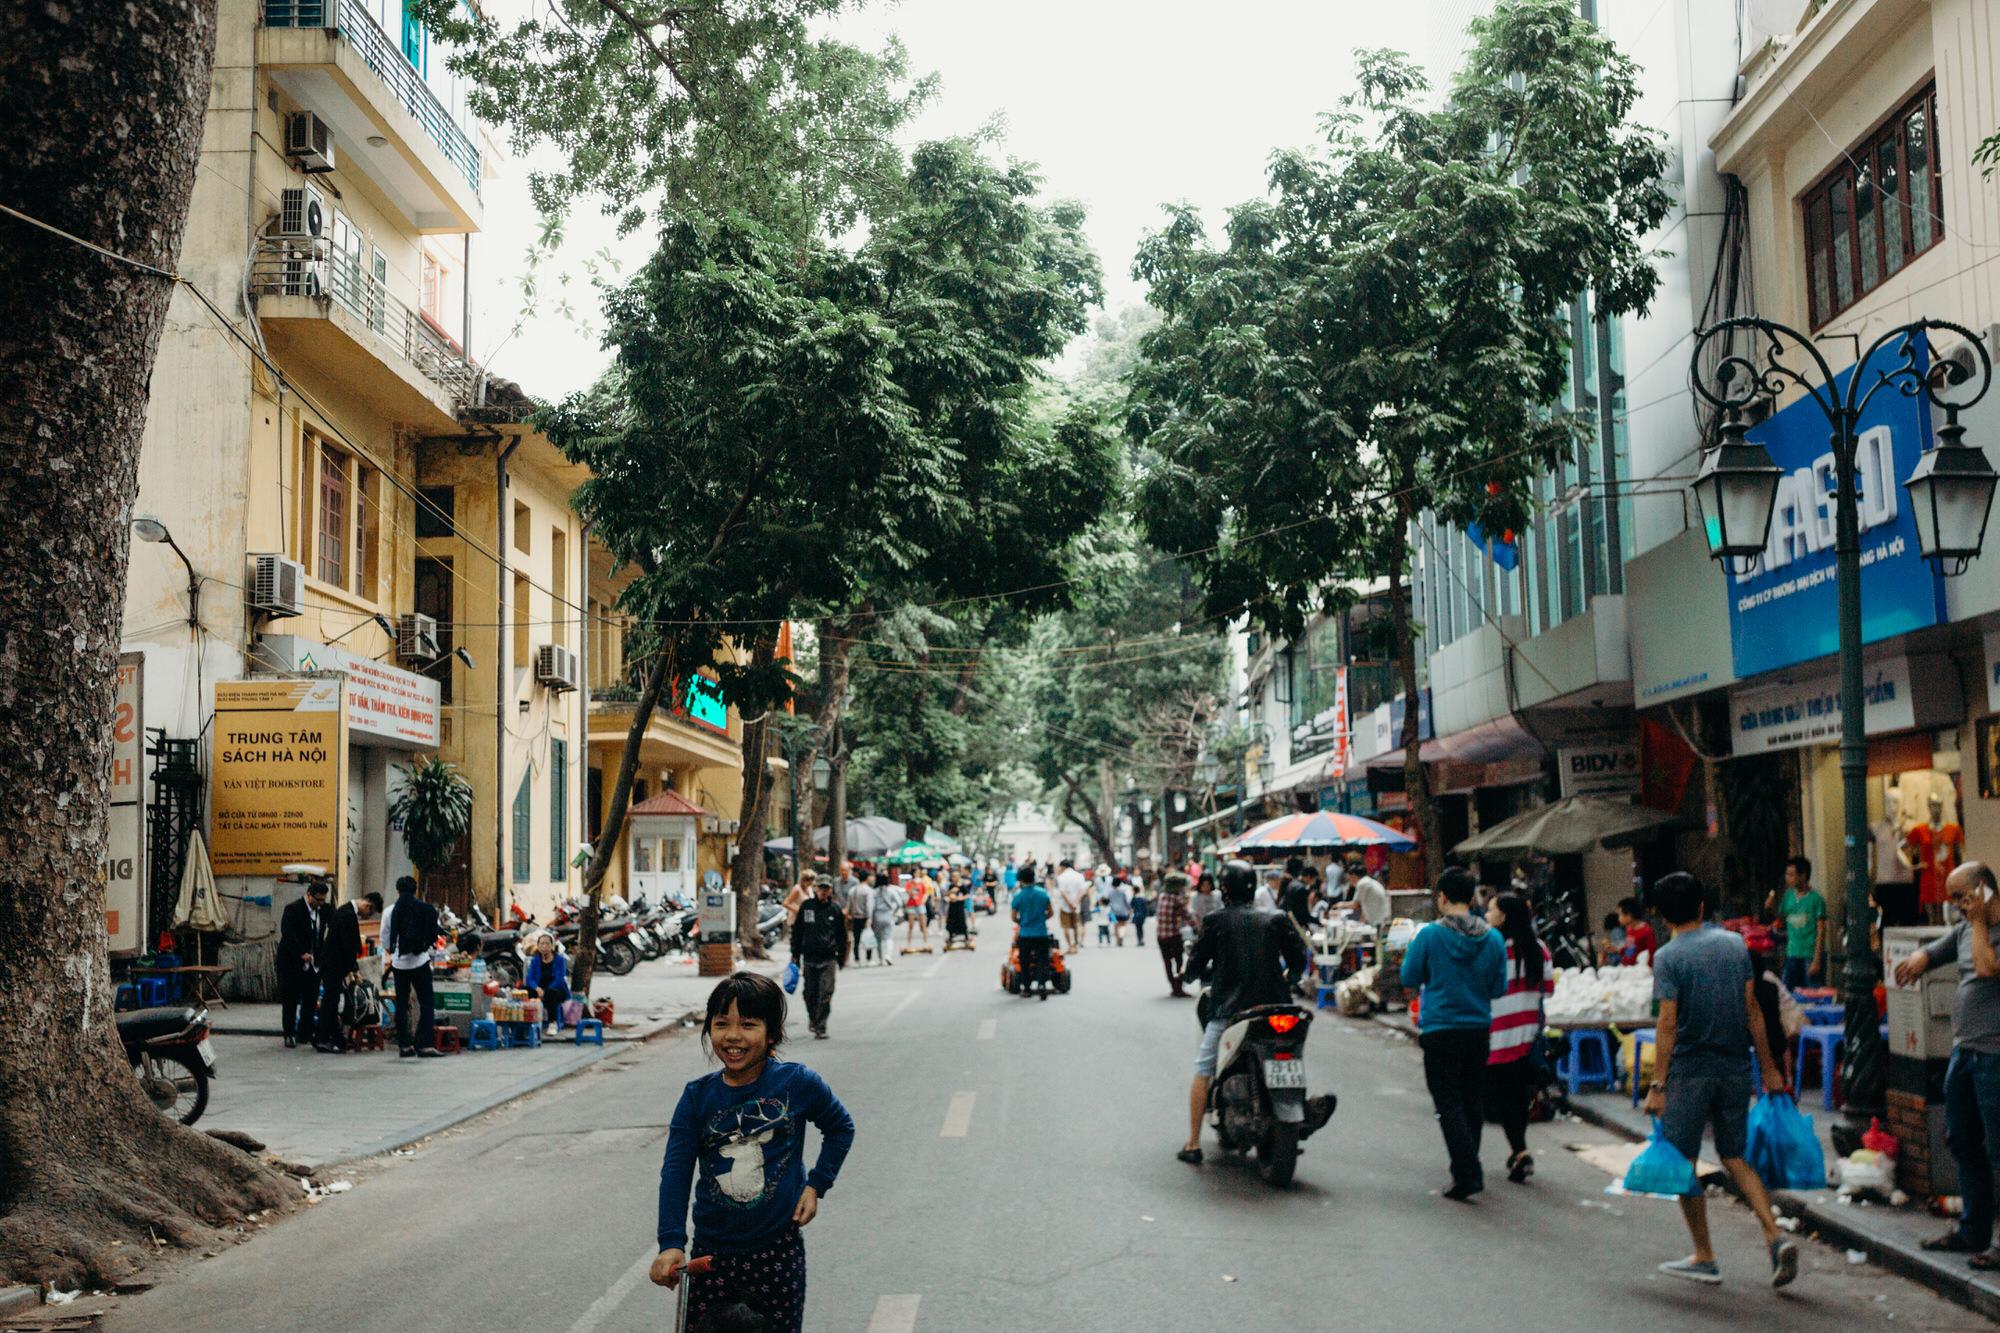 hanoivietnamtravelblog-9611-1.jpg